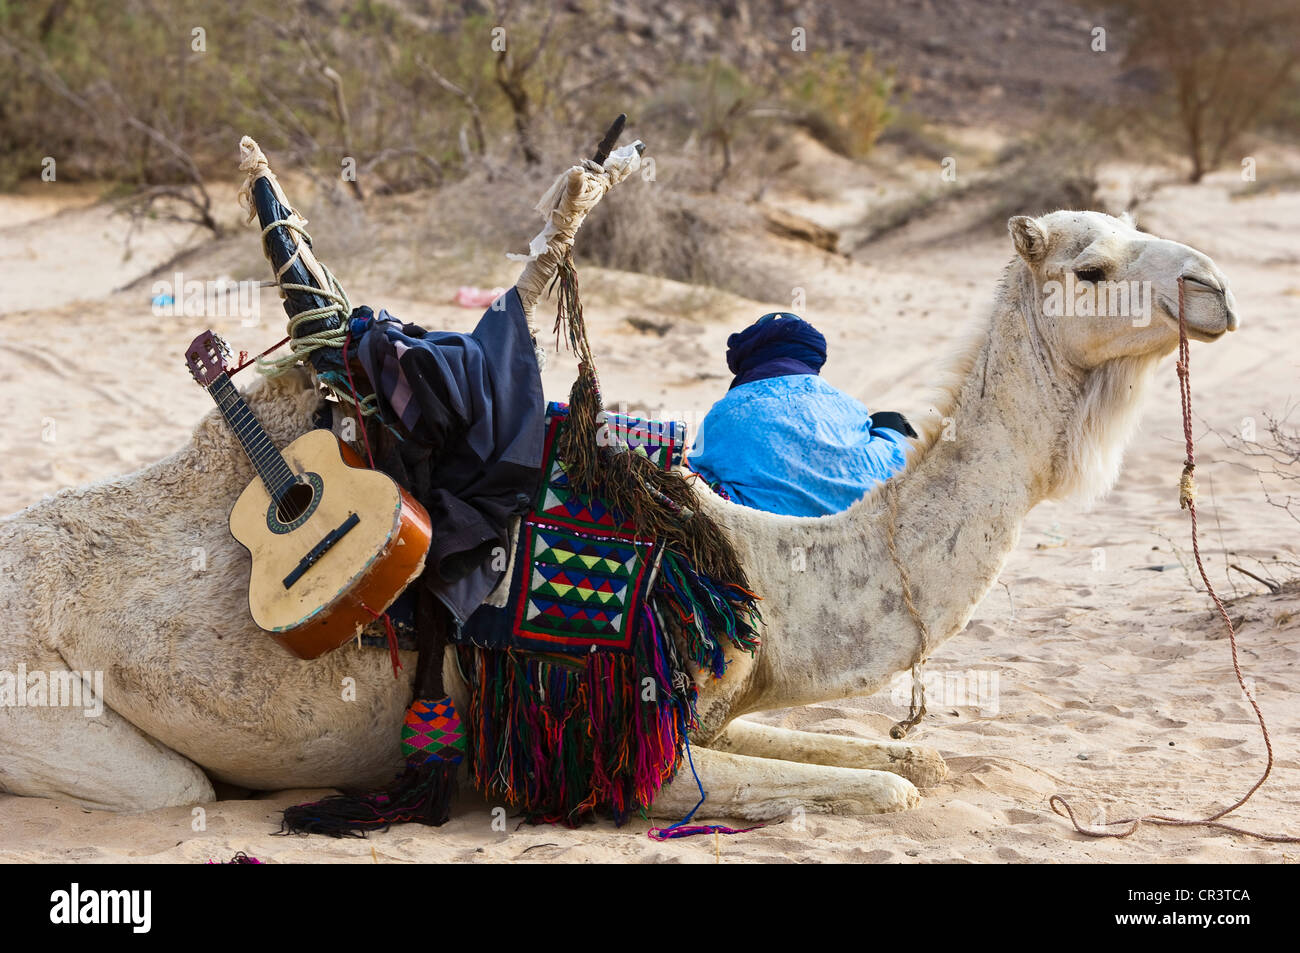 Argelia Sahara, cerca de Djanet, Tassili N'Ajjer Parque Nacional Macizo, Patrimonio Mundial de la UNESCO, hombre Imagen De Stock